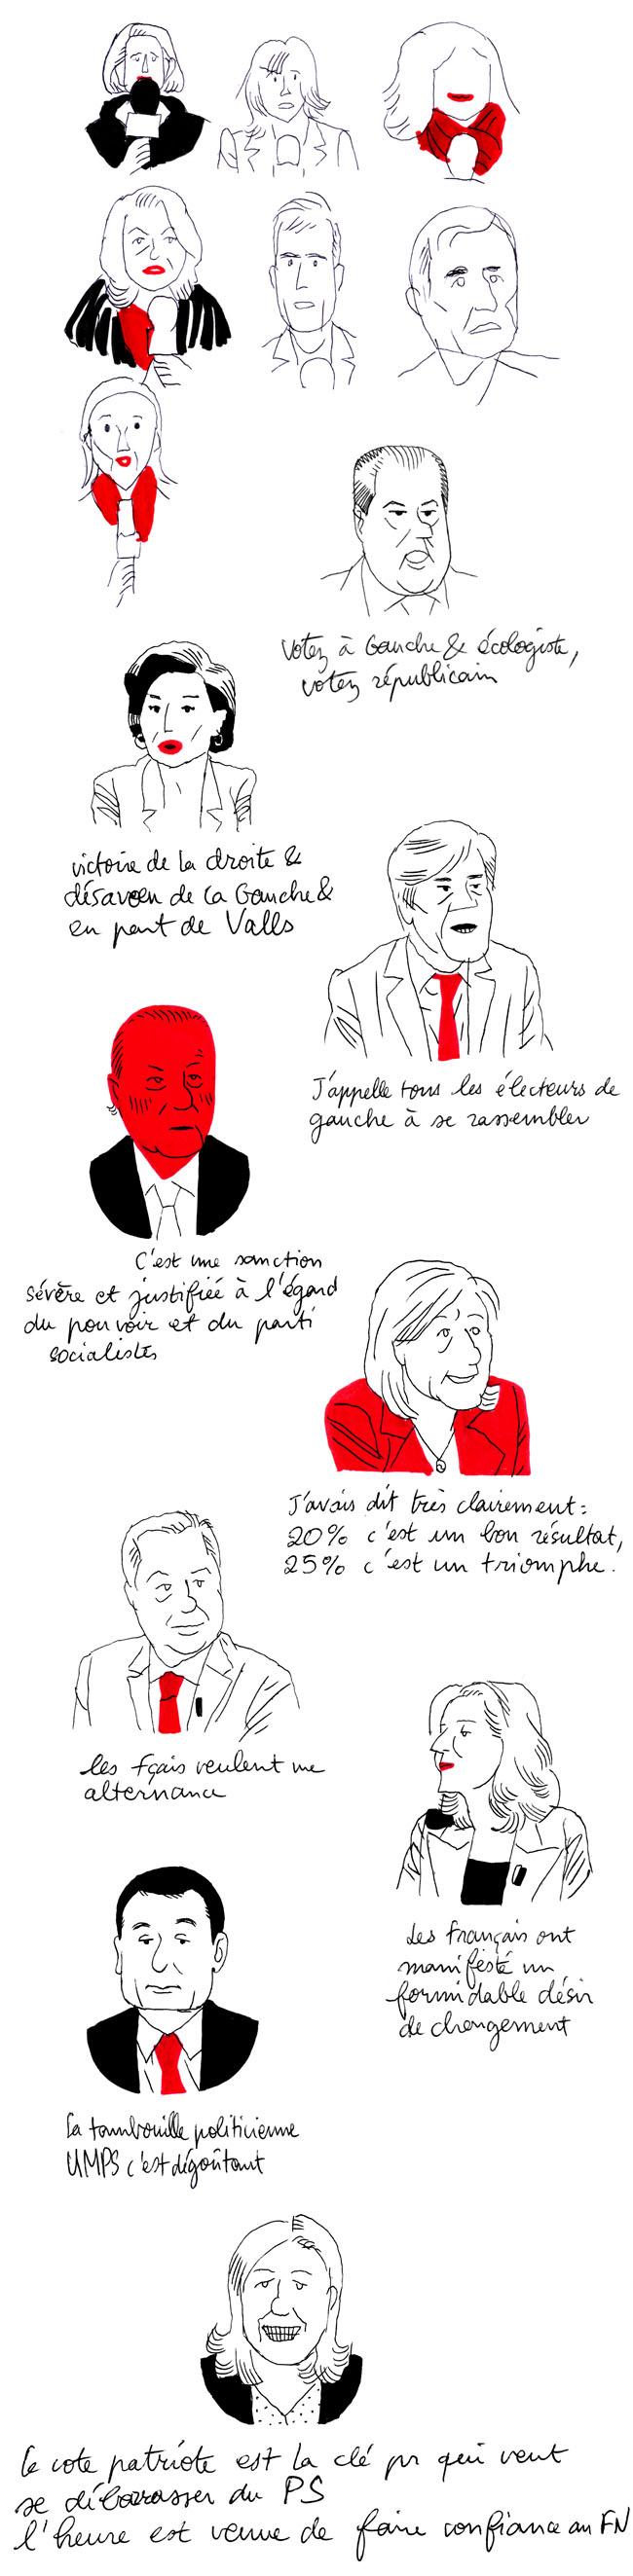 http://sorwellz.free.fr/blog2015/0323-elections.jpg